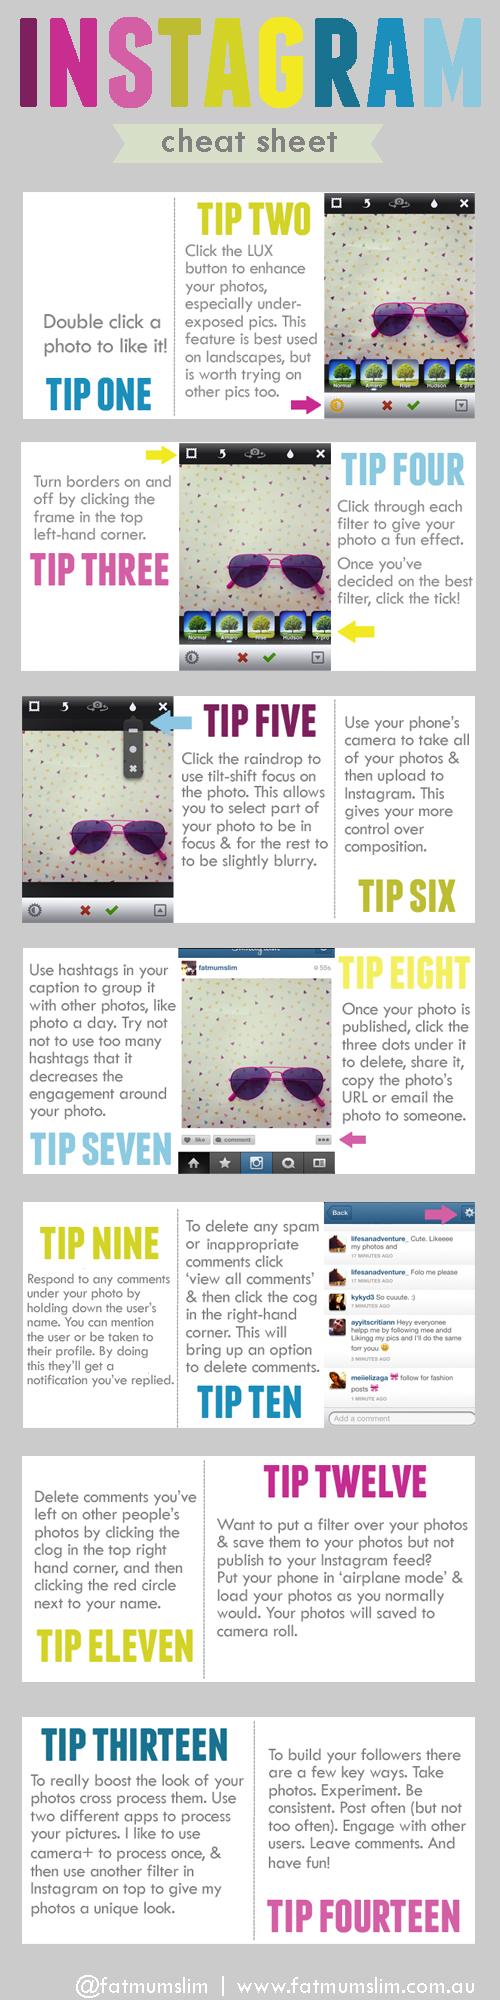 ultimate-instagram-cheat-sheet